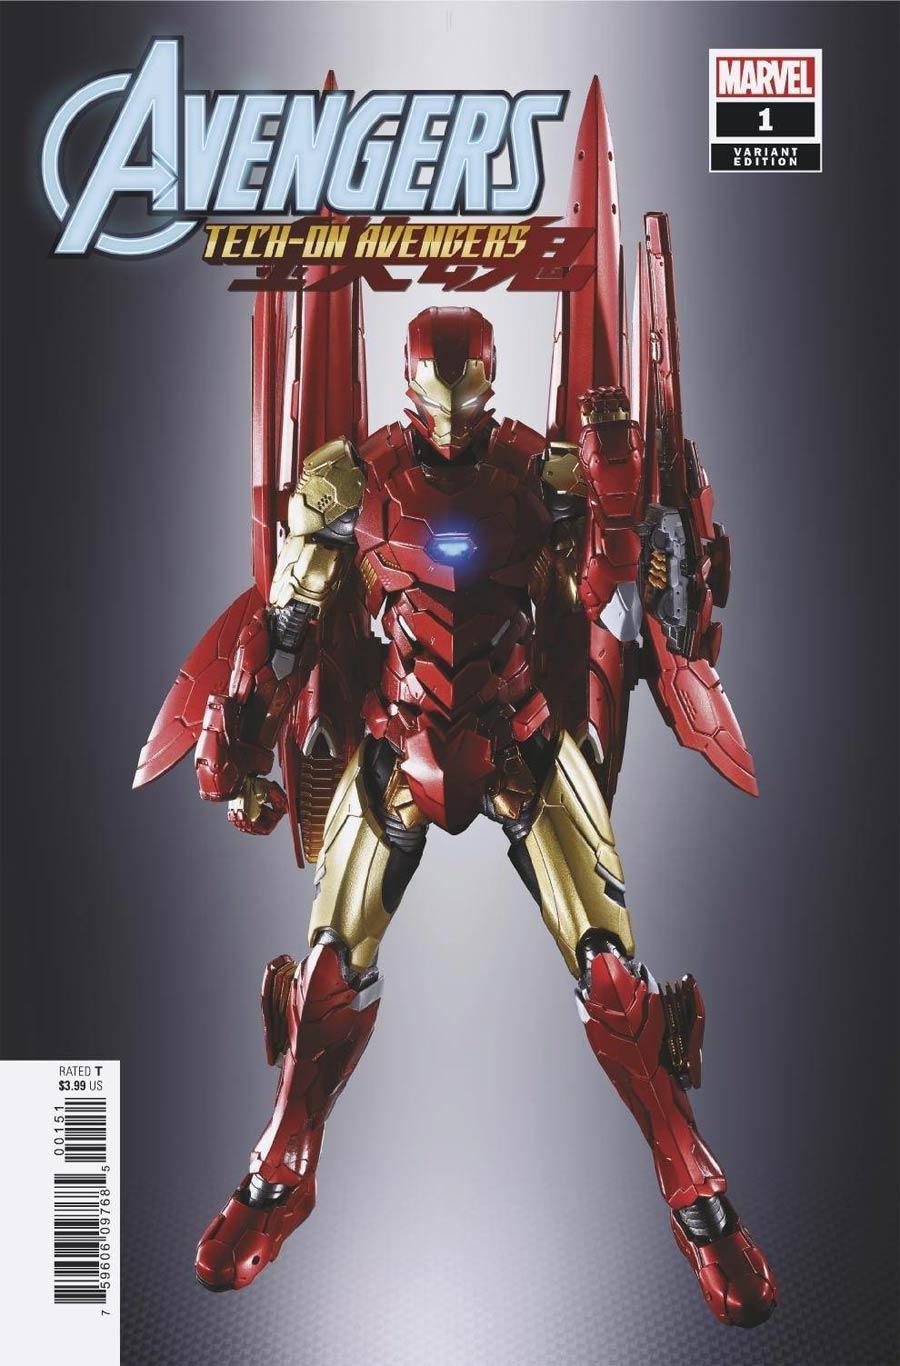 Avengers Tech-On Avengers #1 Cover D Variant Toy Cover